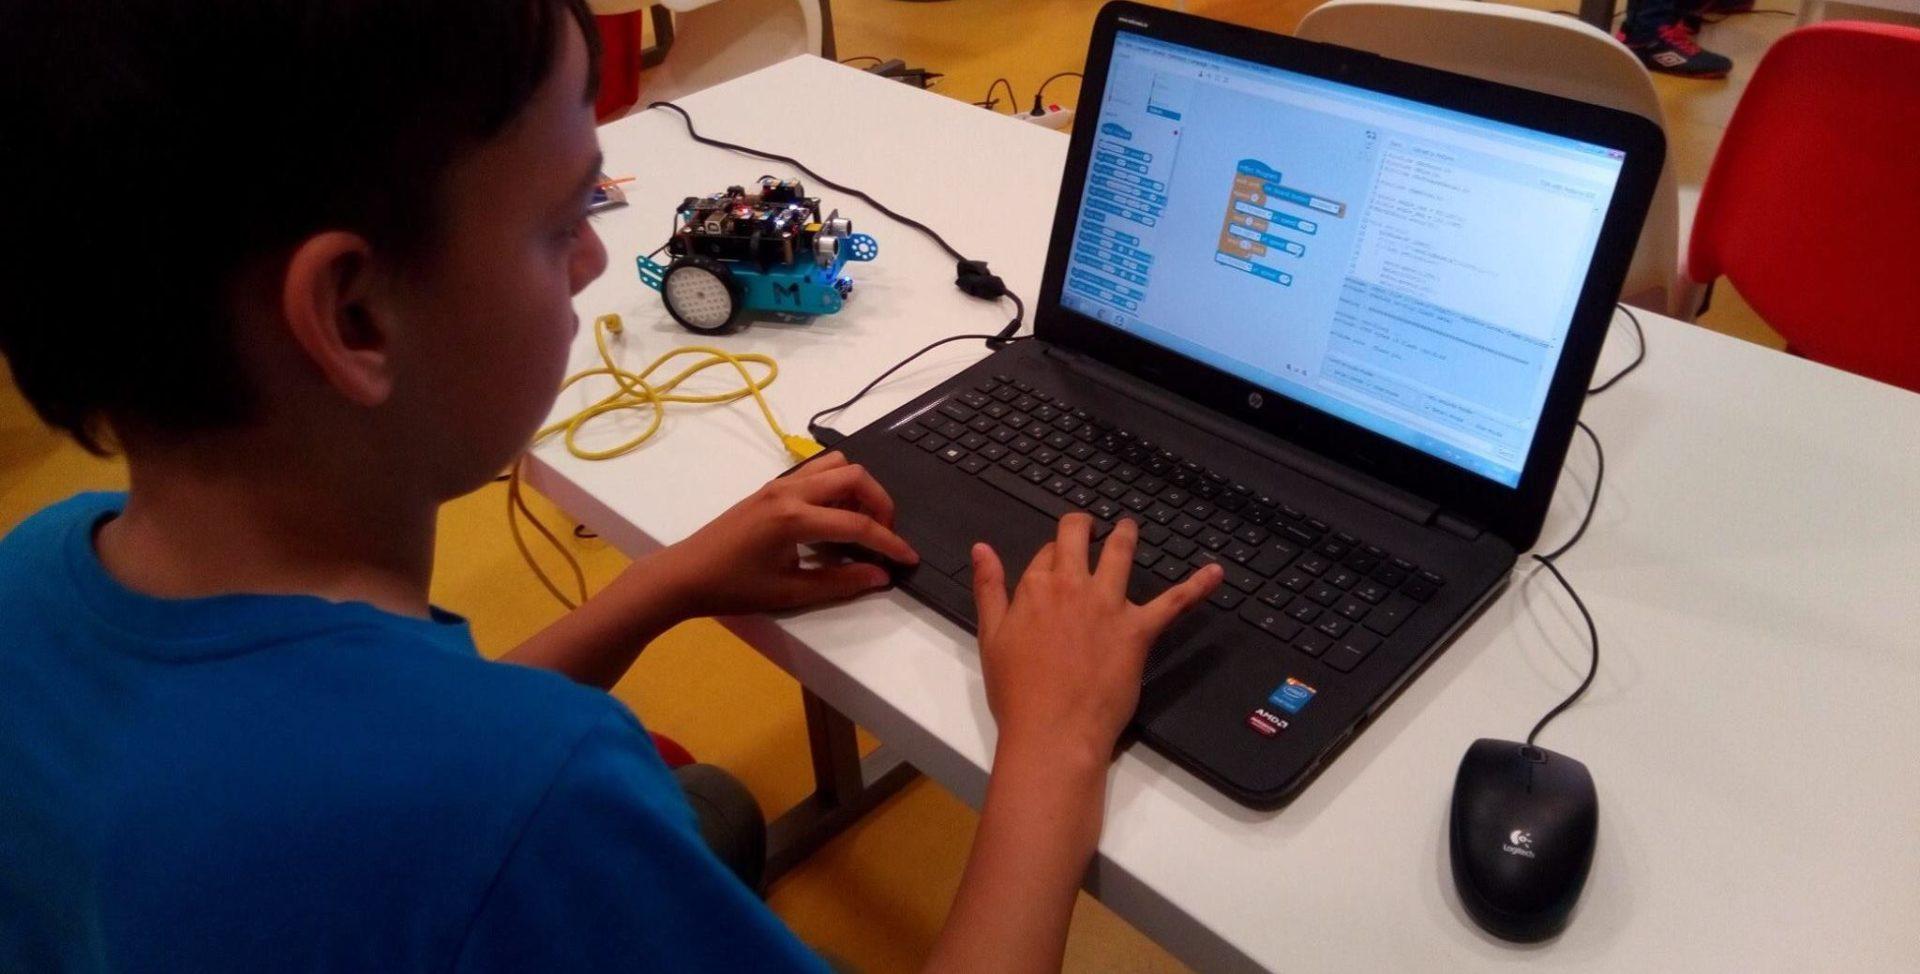 CARNET Rezultati završnog vrednovanja digitalne zrelosti škola